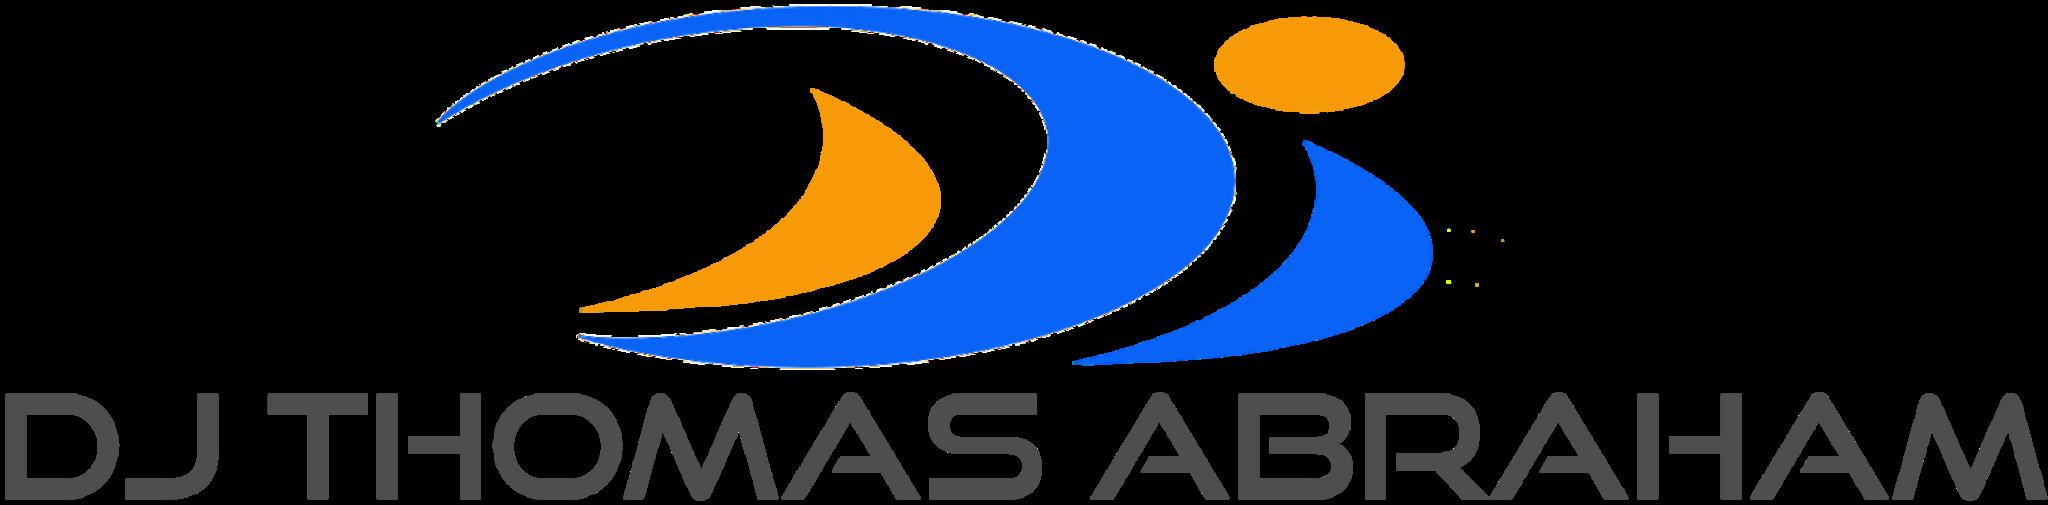 DJ Thomas Abraham Logo